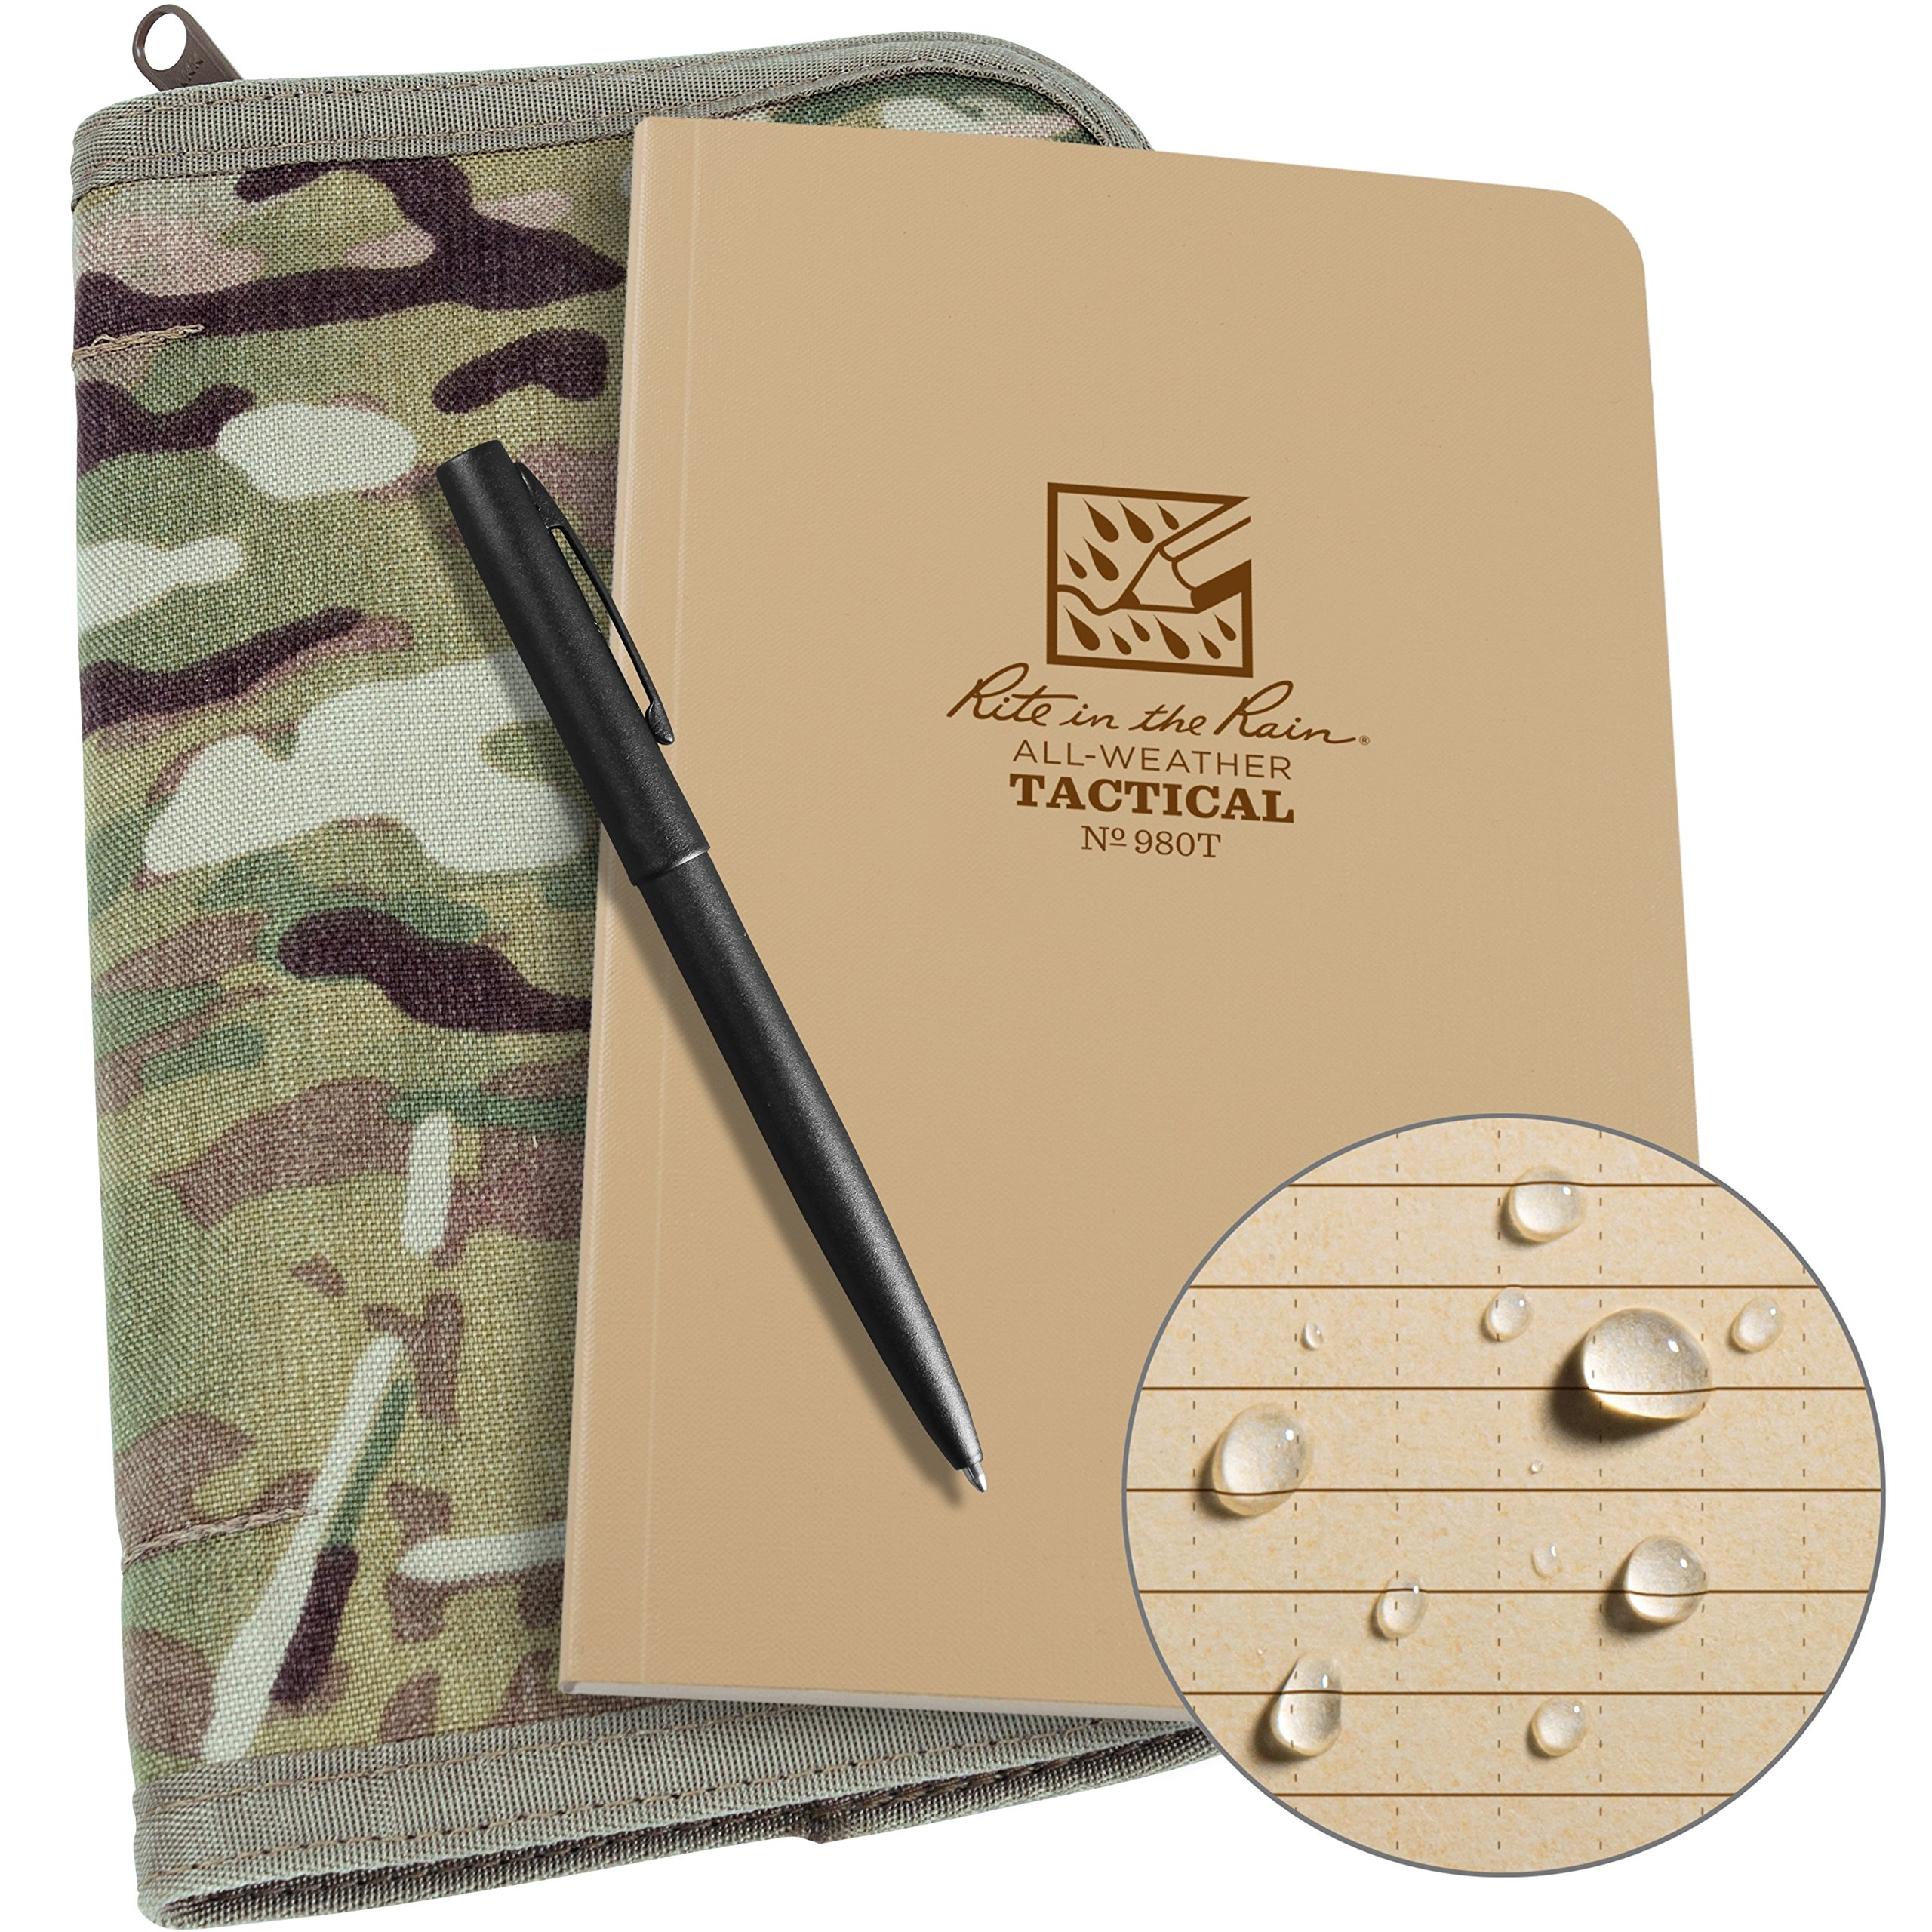 Rite in the Rain Weatherproof Tactical Field Kit: MultiCam CORDURA Fabric Cover, 4 5/8'' x 7 1/4'' Tan Tactical Notebook, Weatherproof Pen (No. 980M-KIT)